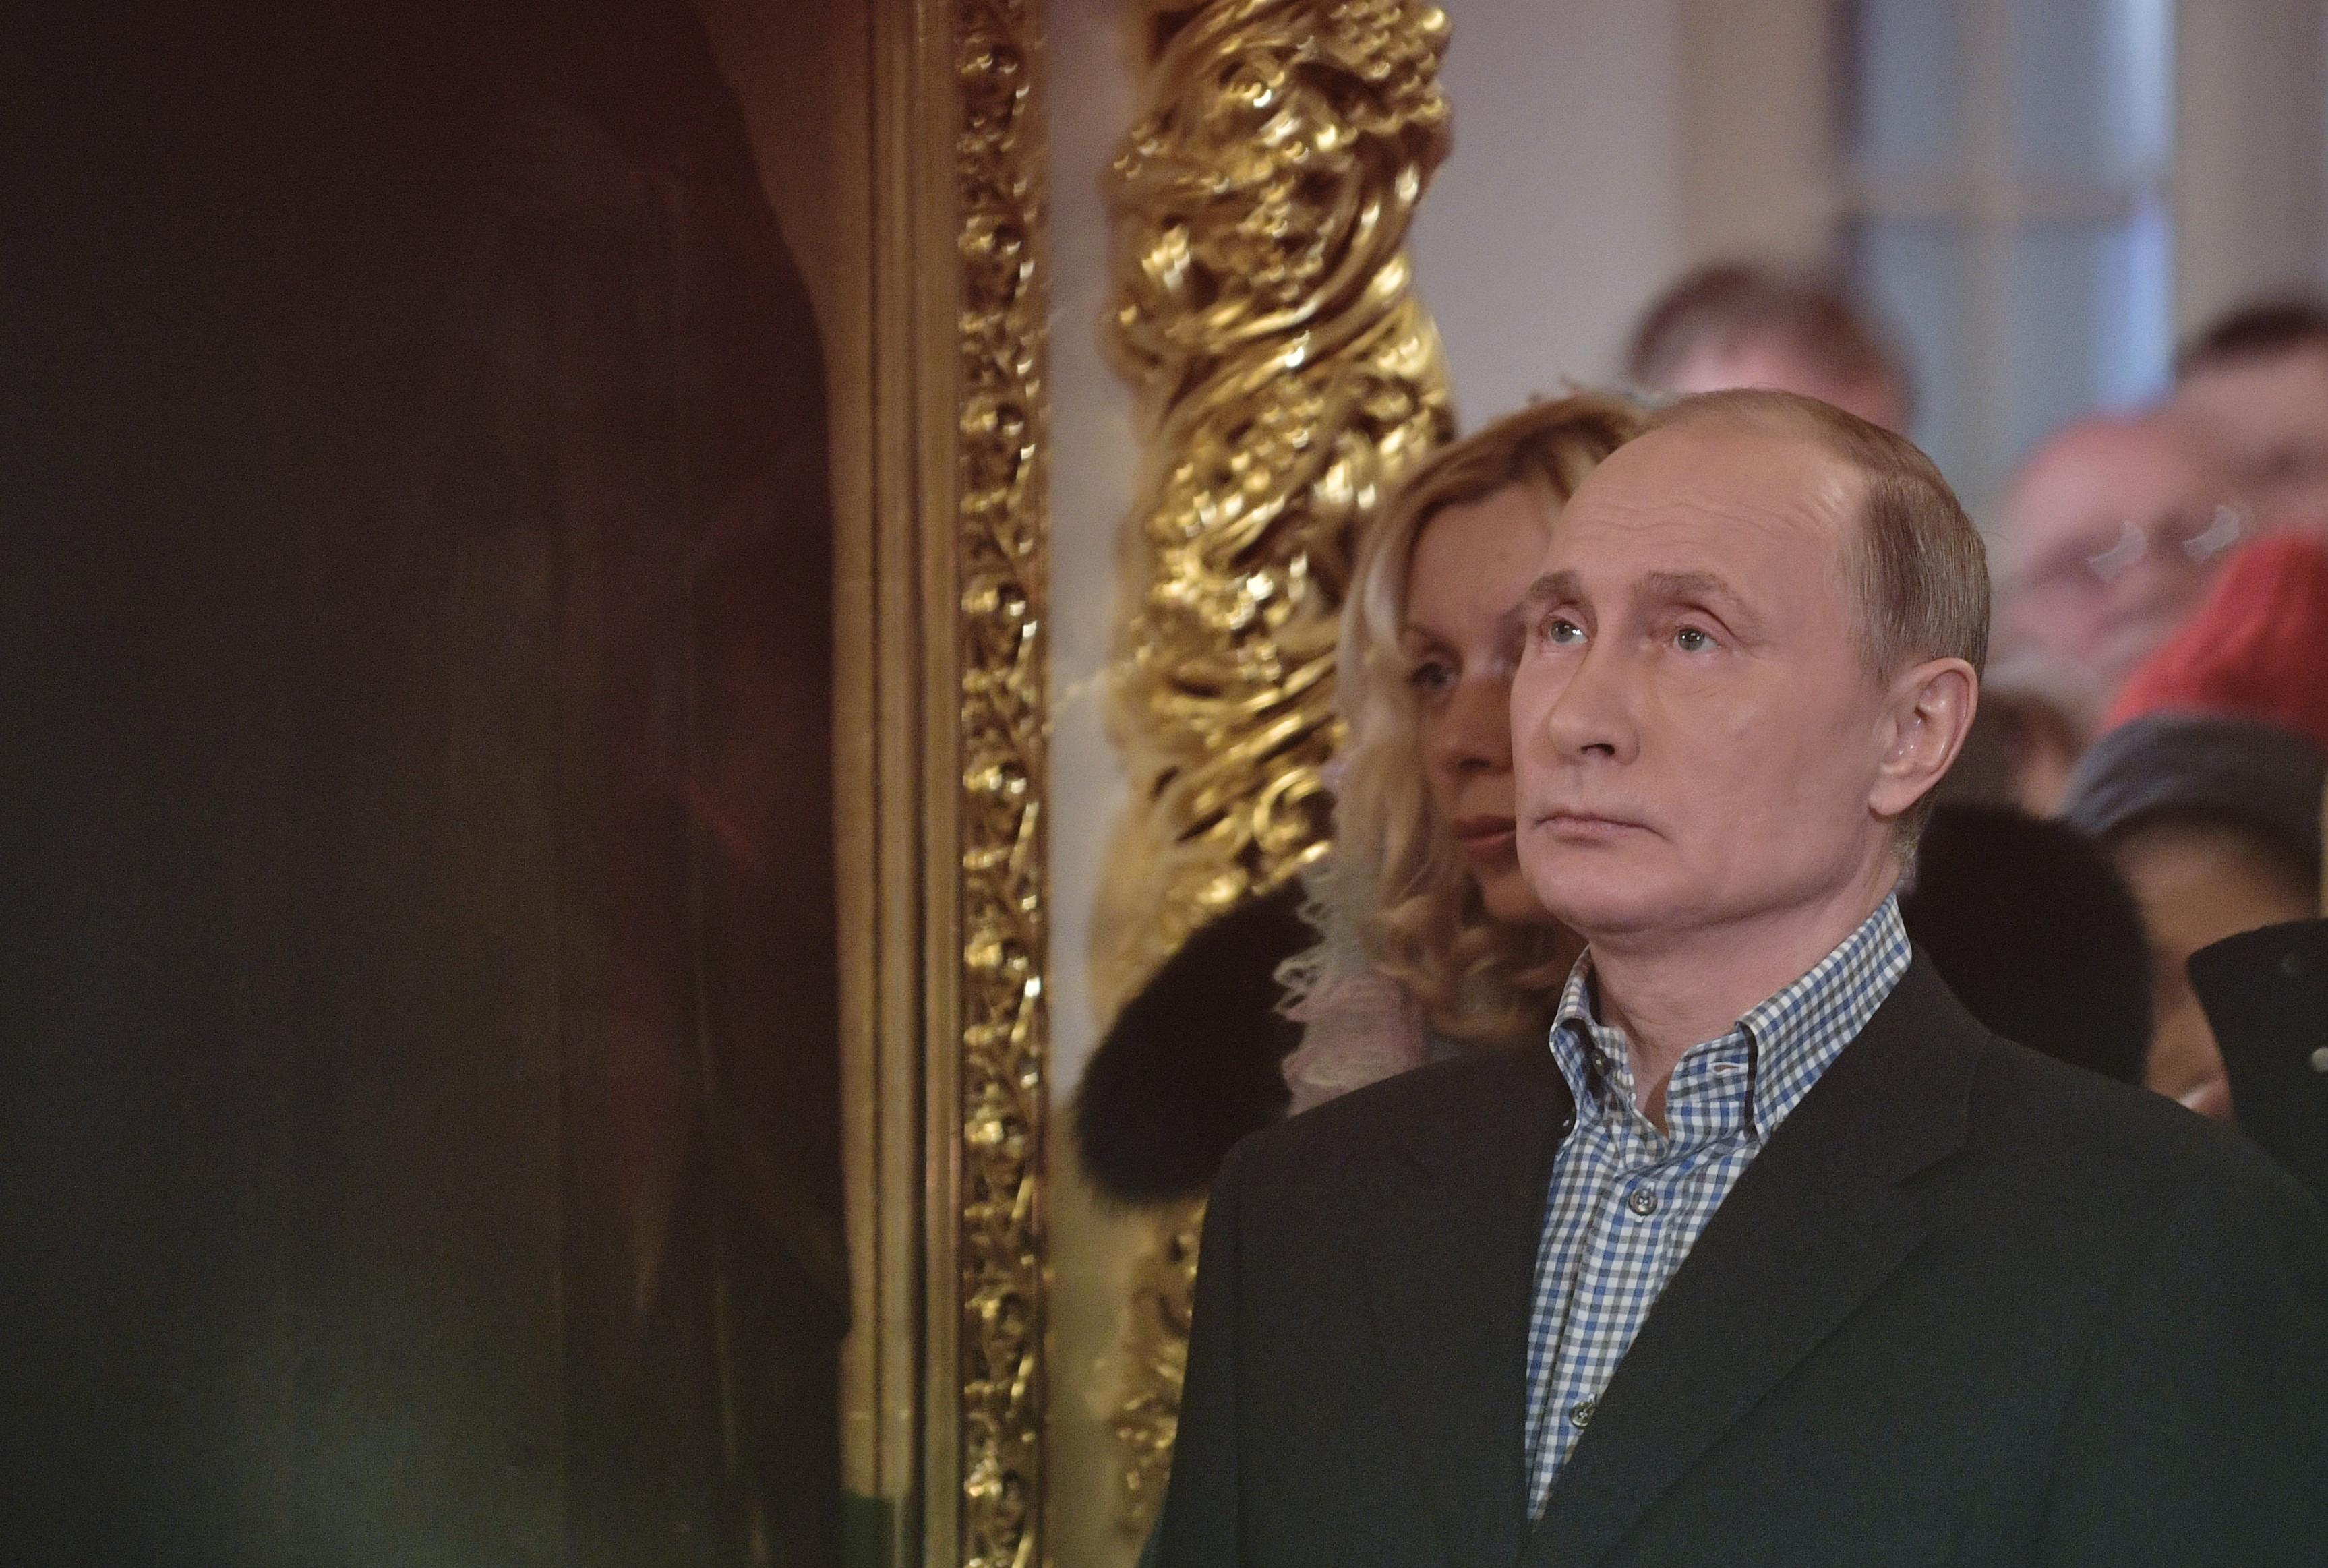 <p>Президент РФ Владимир Путин. Фото: &copy;РИА Новости/Алексей Никольский</p>